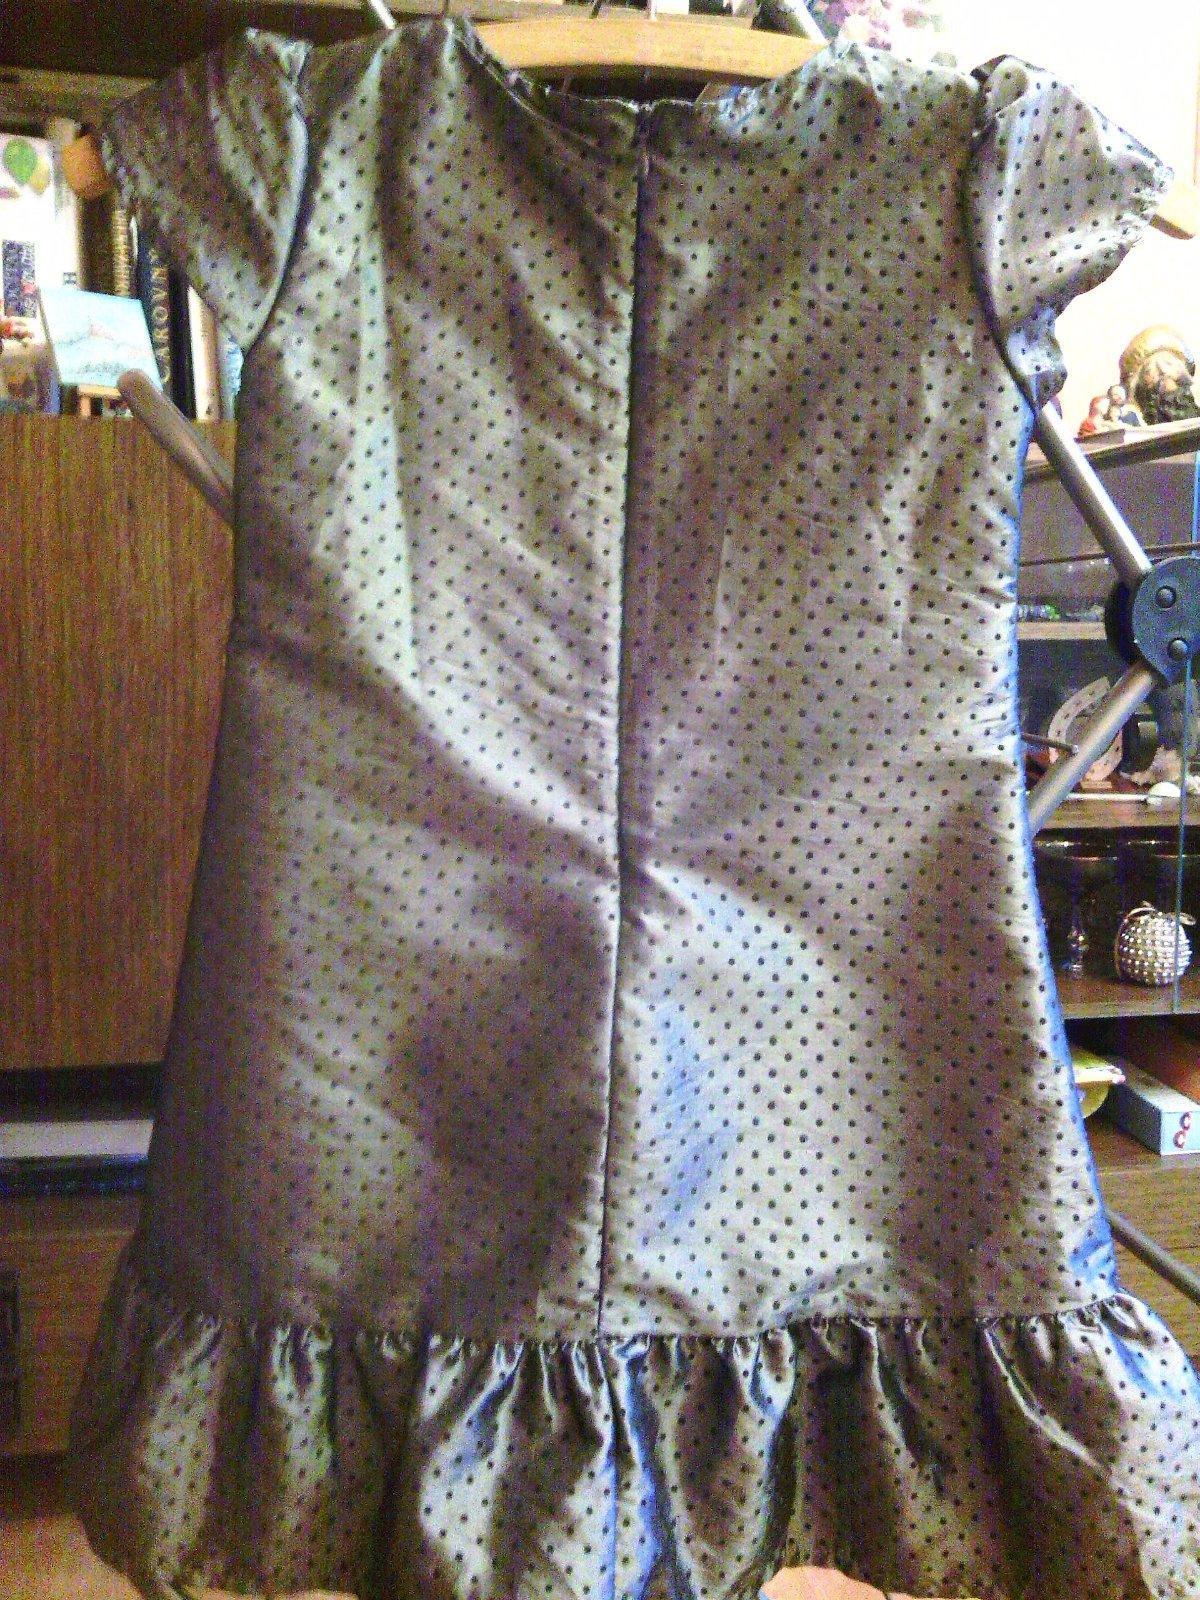 Perleťové šaty na bodky - Obrázok č. 2